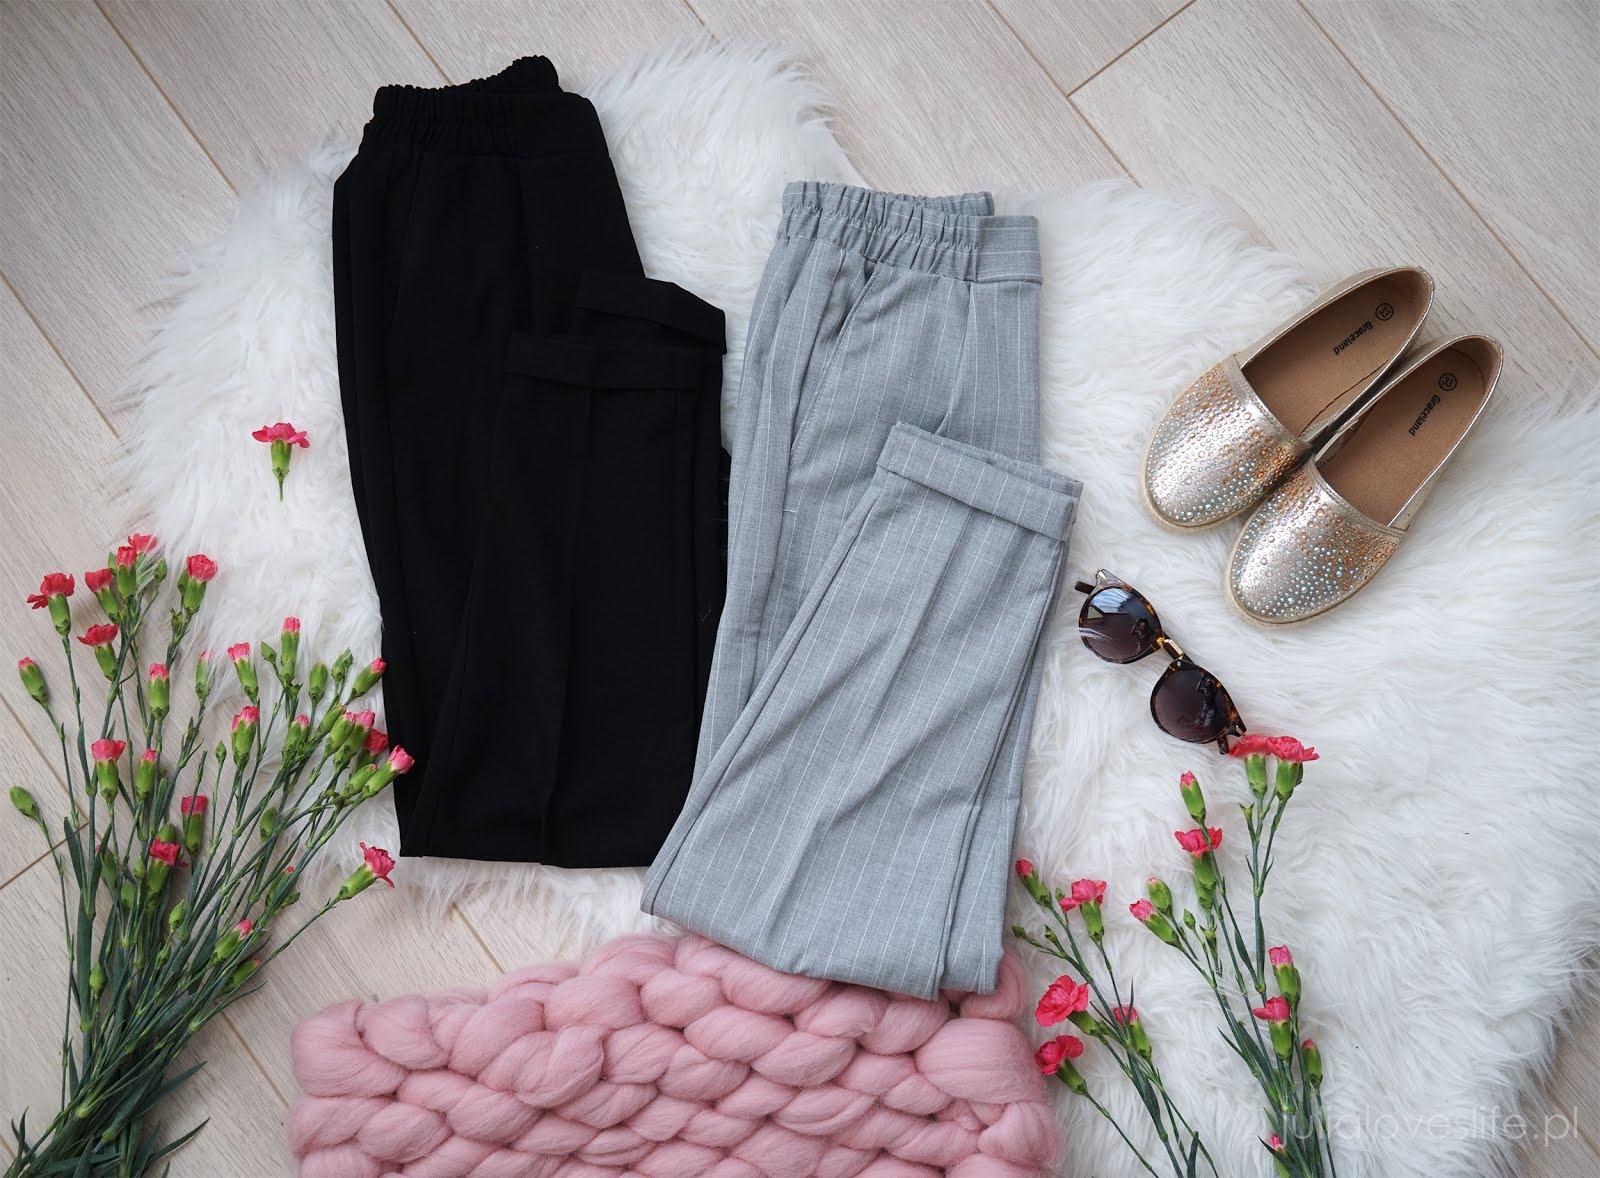 spodnie Bershka loveandgreatshoes